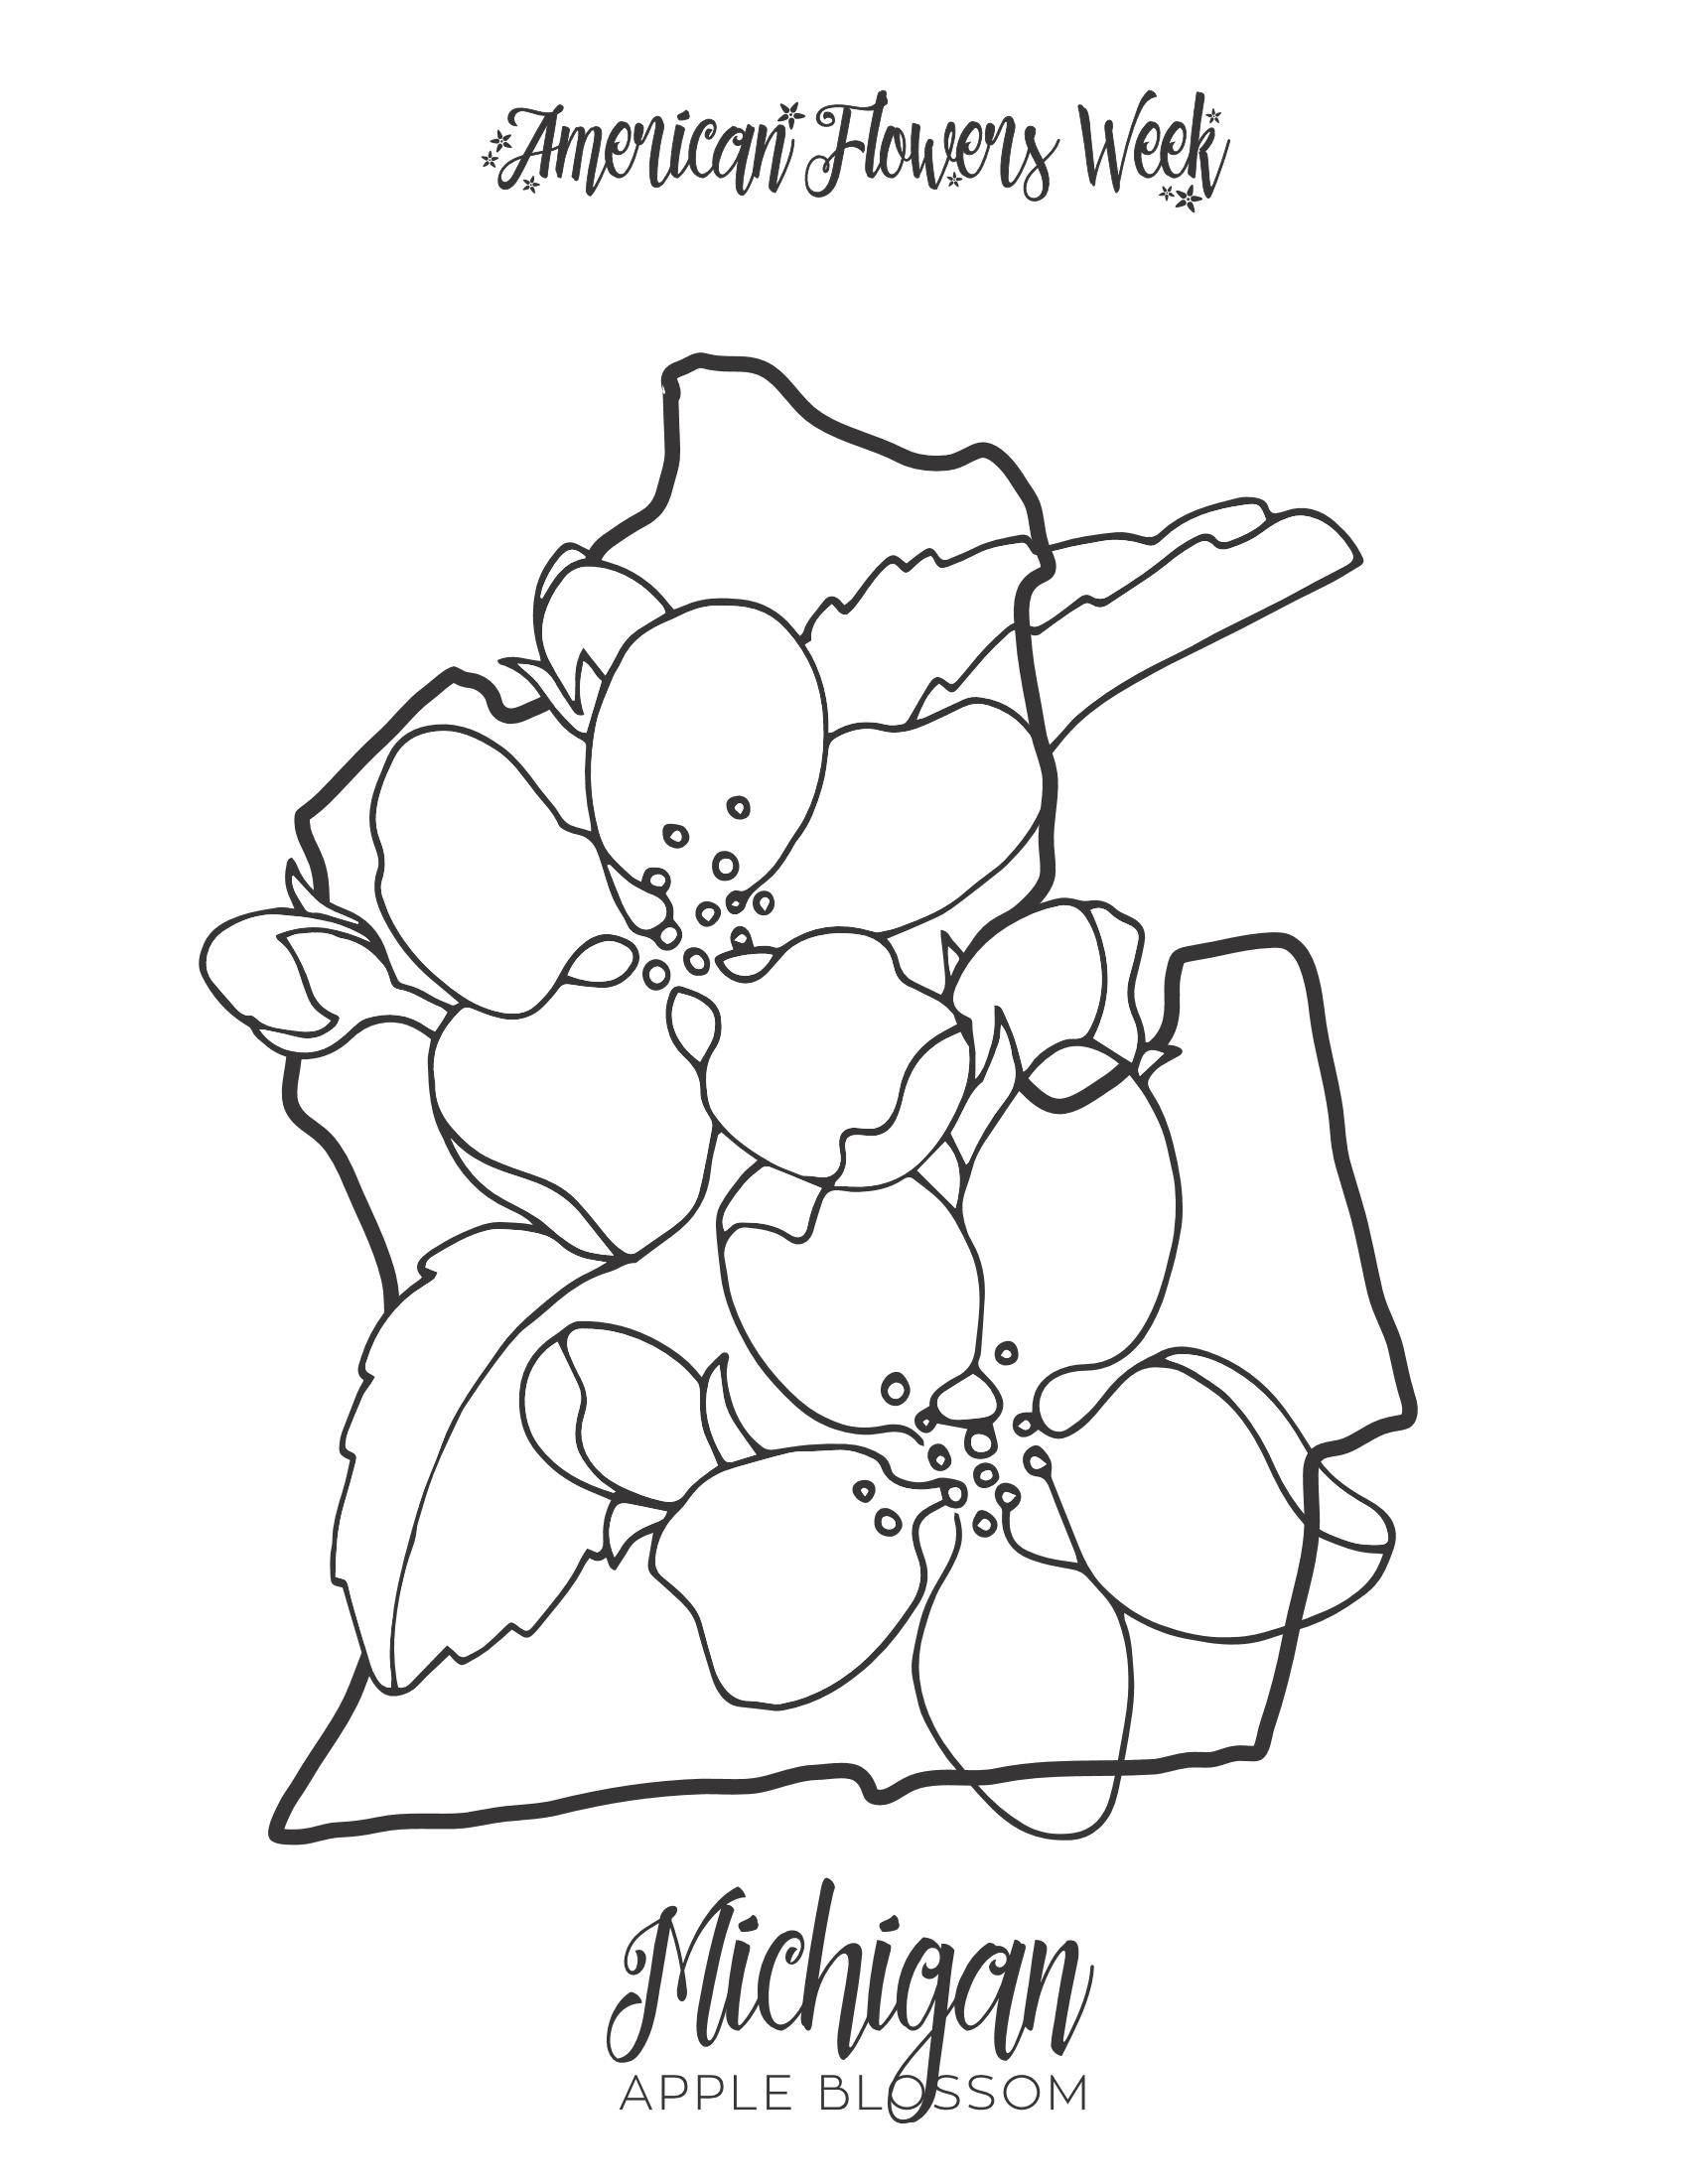 Michigan Apple Blossom PDF